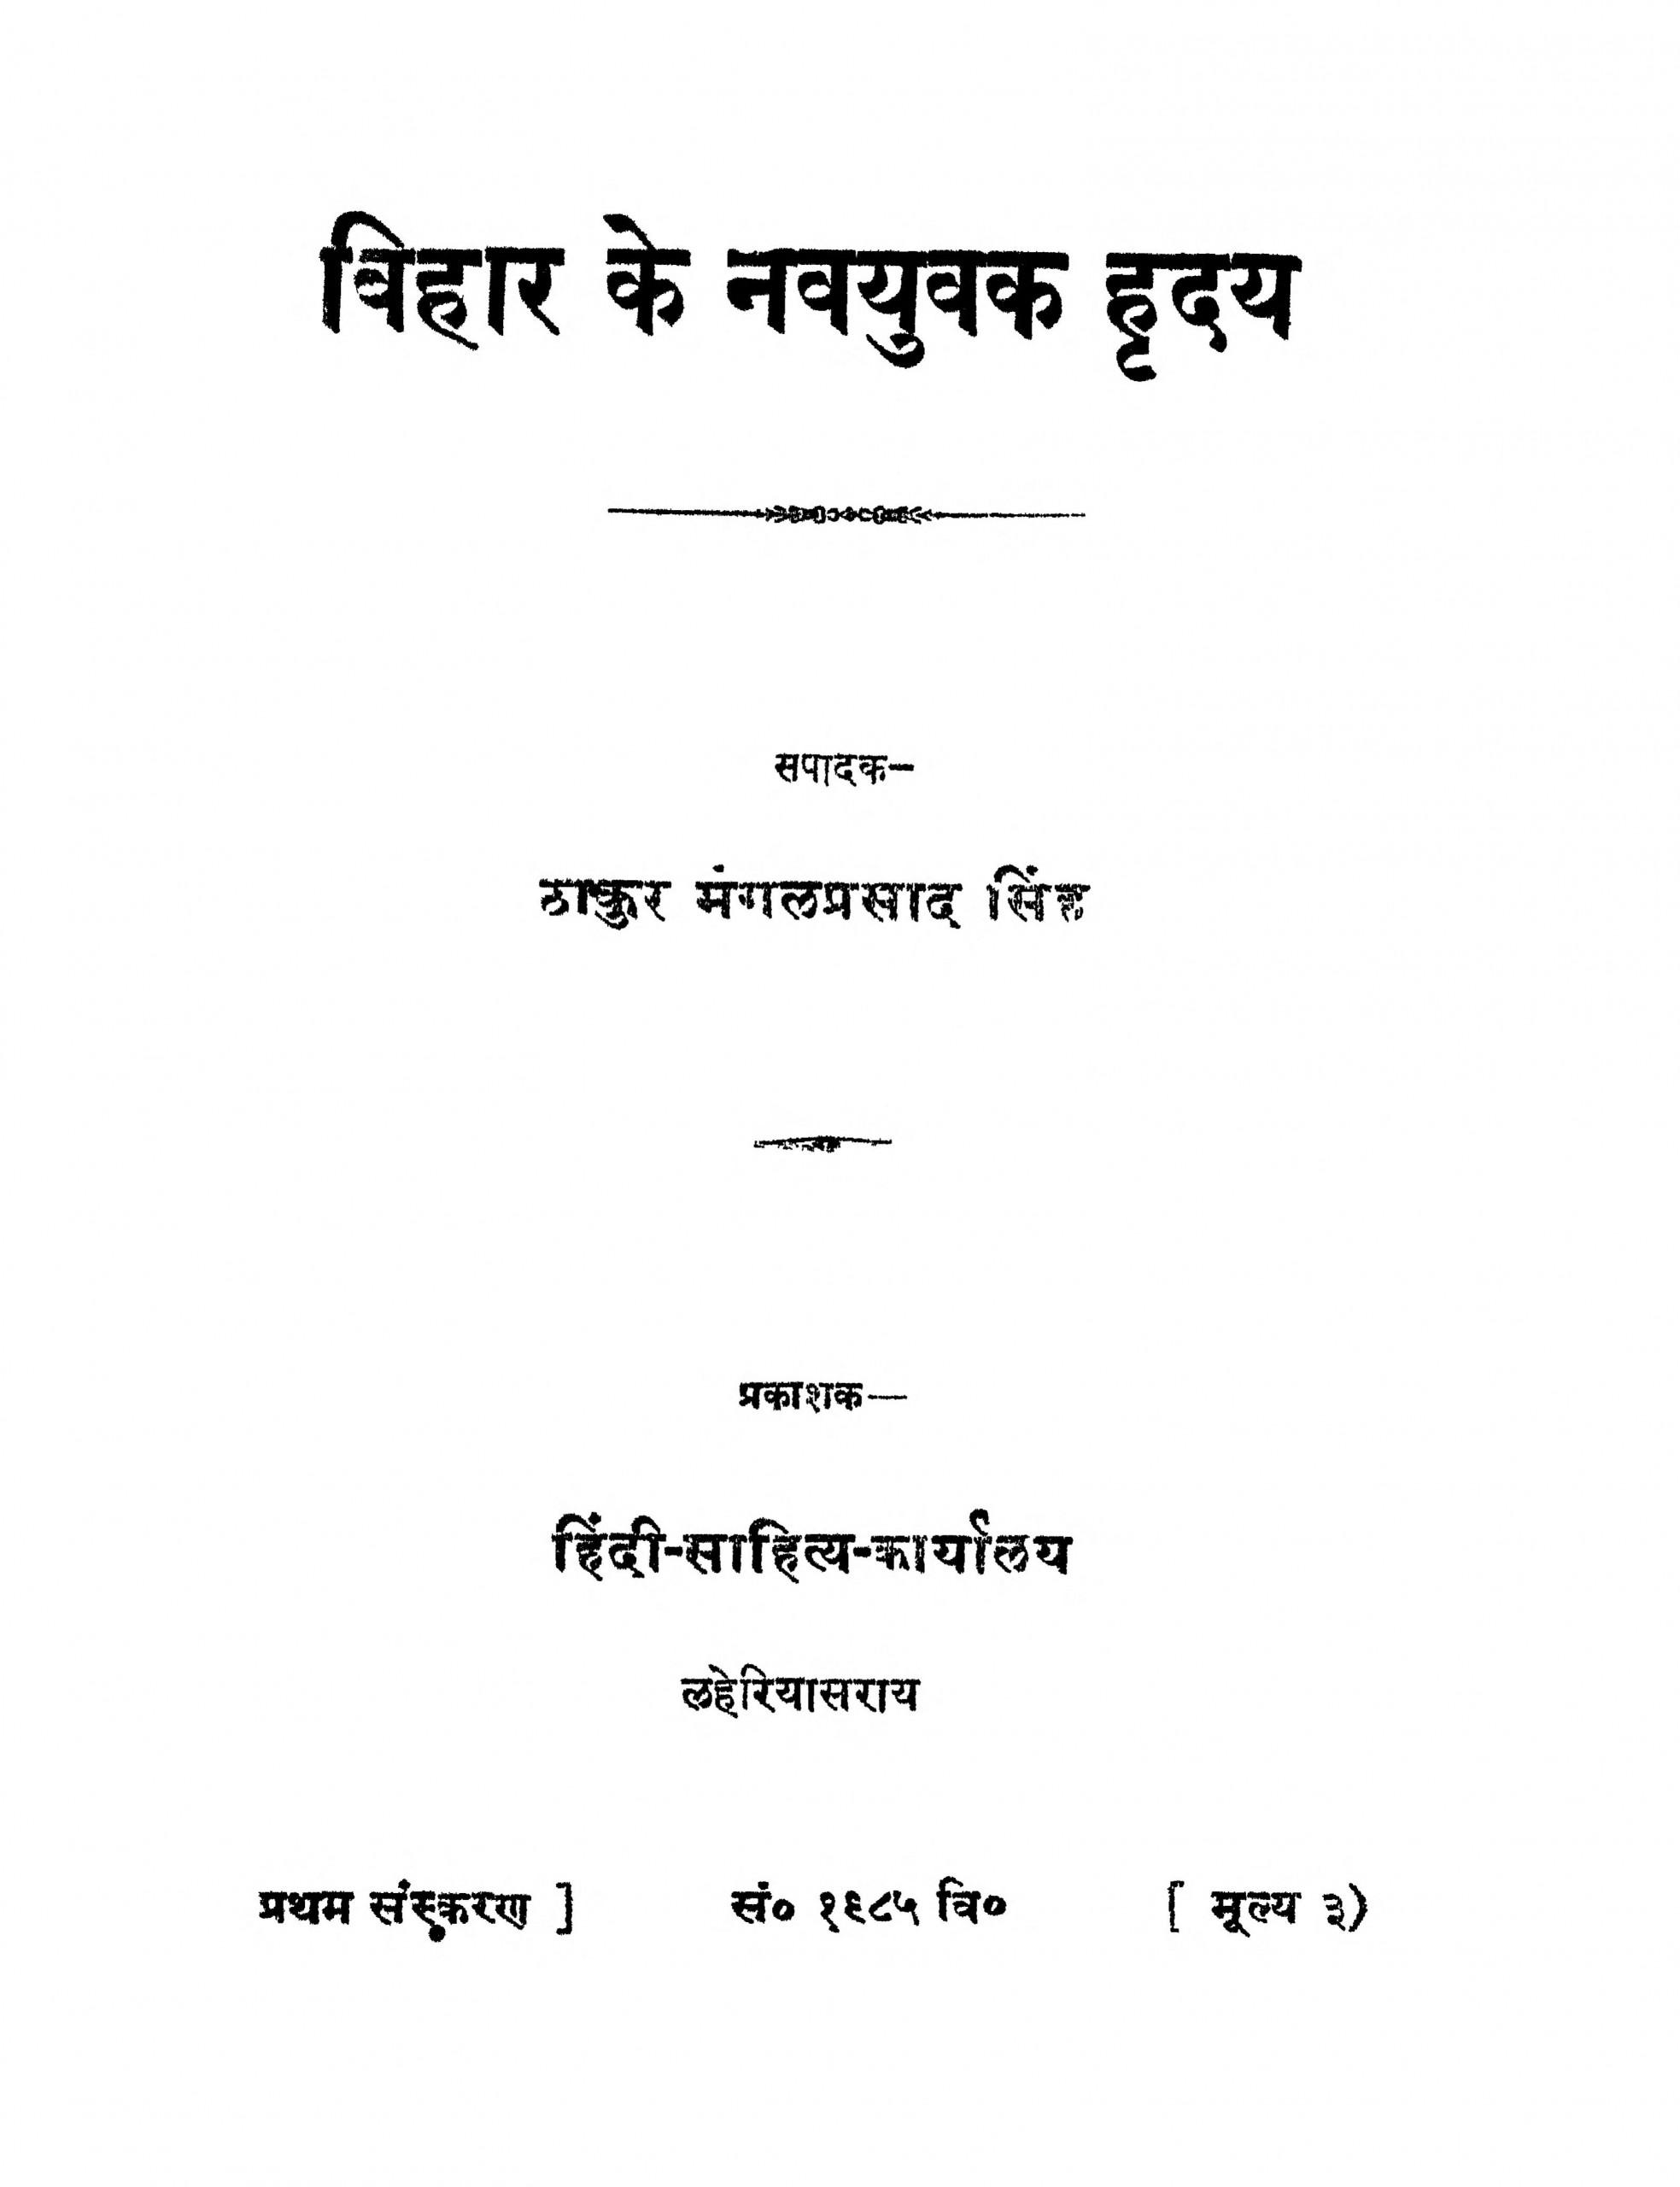 Book Image : बिहार के नवयुवक हृदय - Bihar Ke Navyuvak Hriday